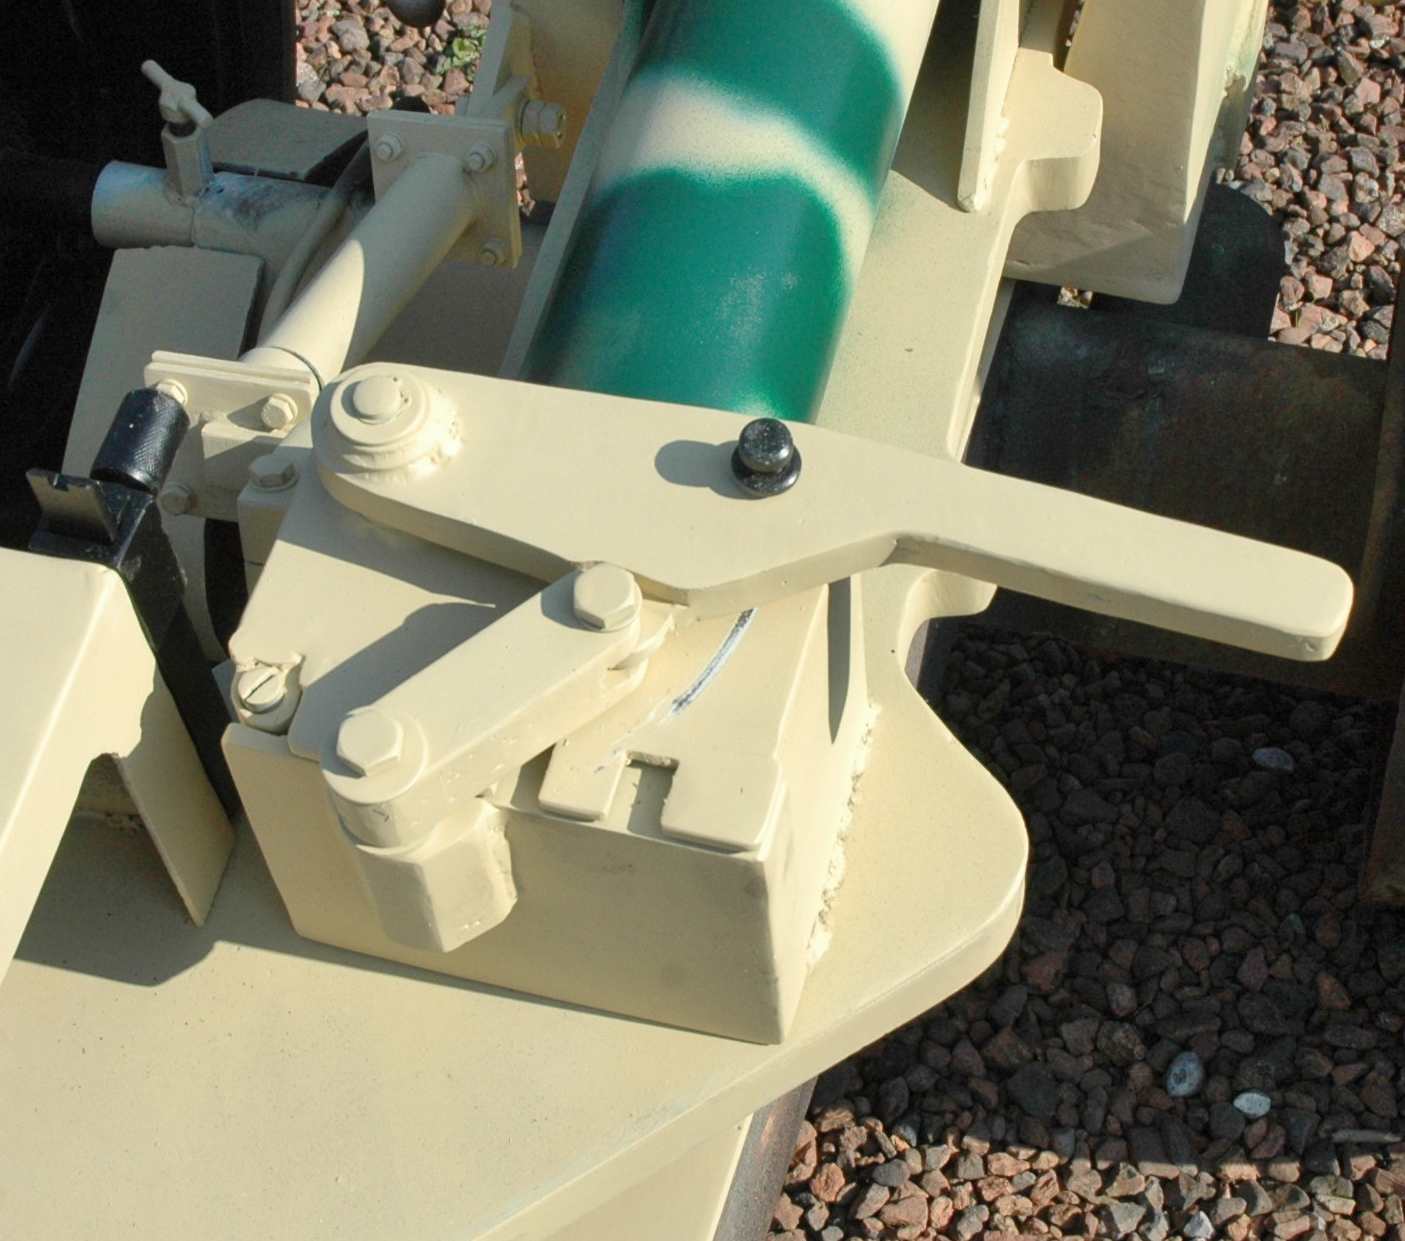 8.8 cm Raketenwerfer 43 Dsc9541r